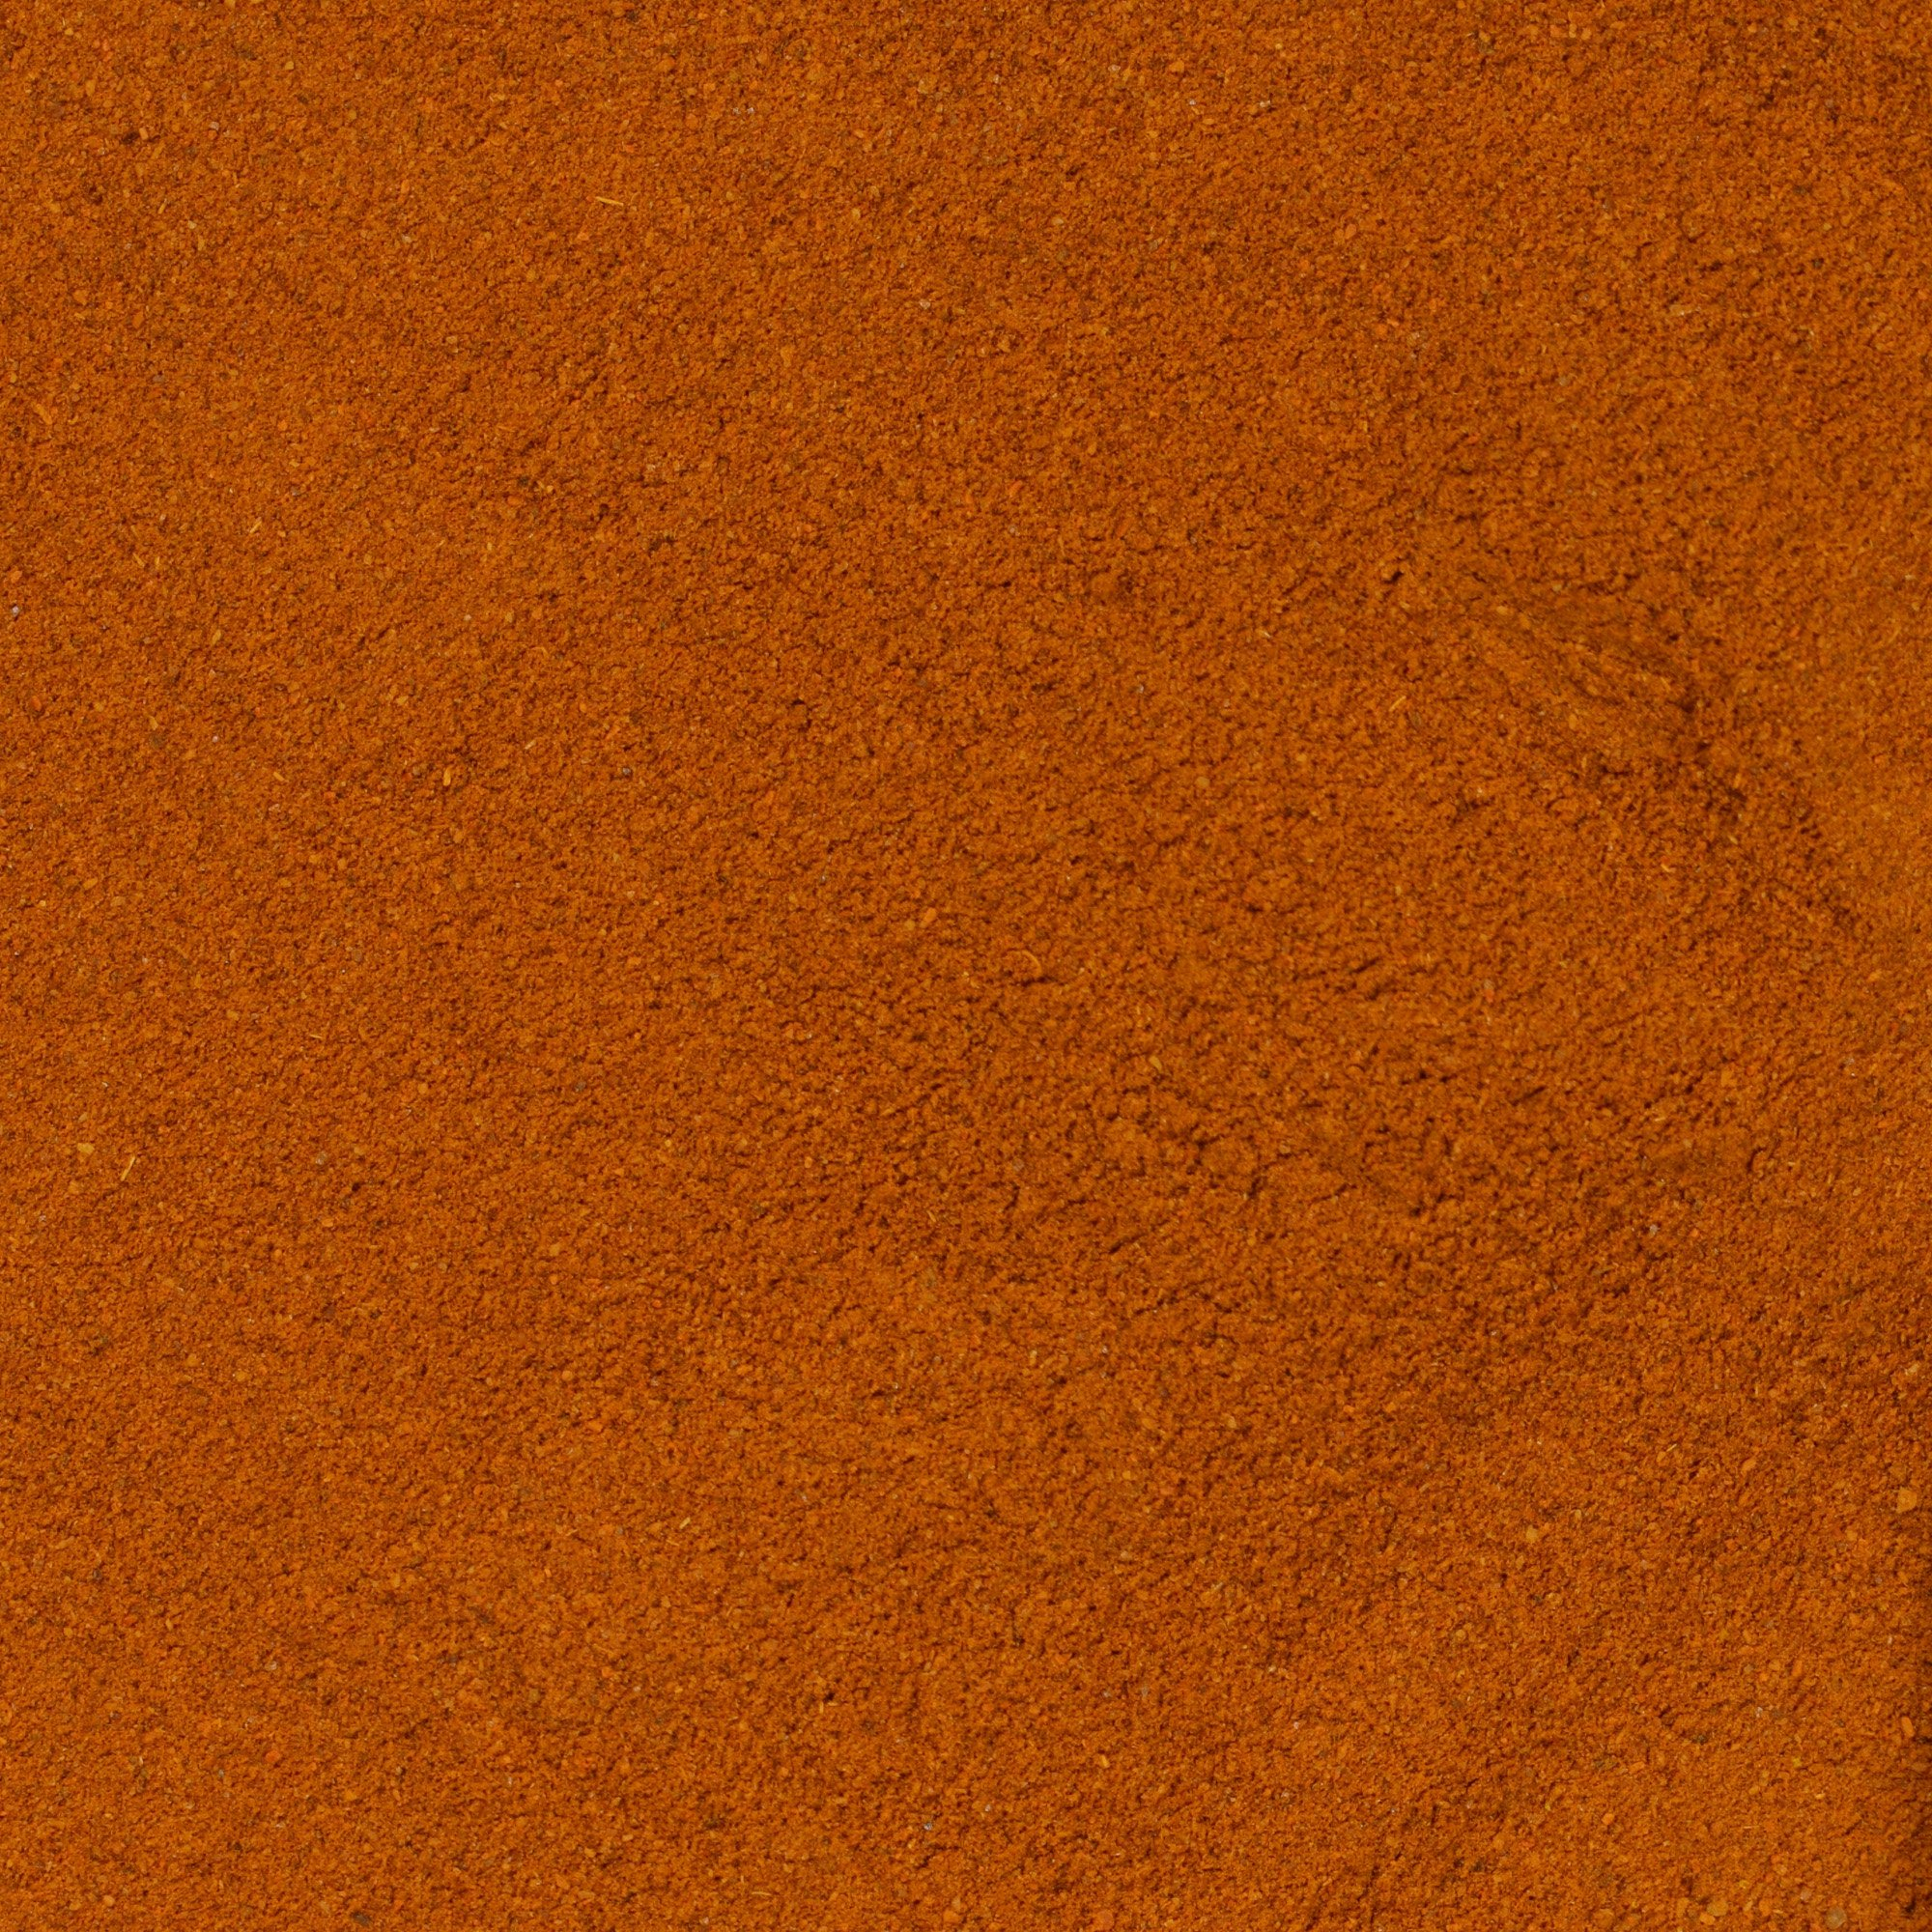 The Spice Lab No. 91 - Scotch Bonnet Powder Spice - All Natural Kosher Non GMO Gluten Free Spice - 4 oz Resealable Bag